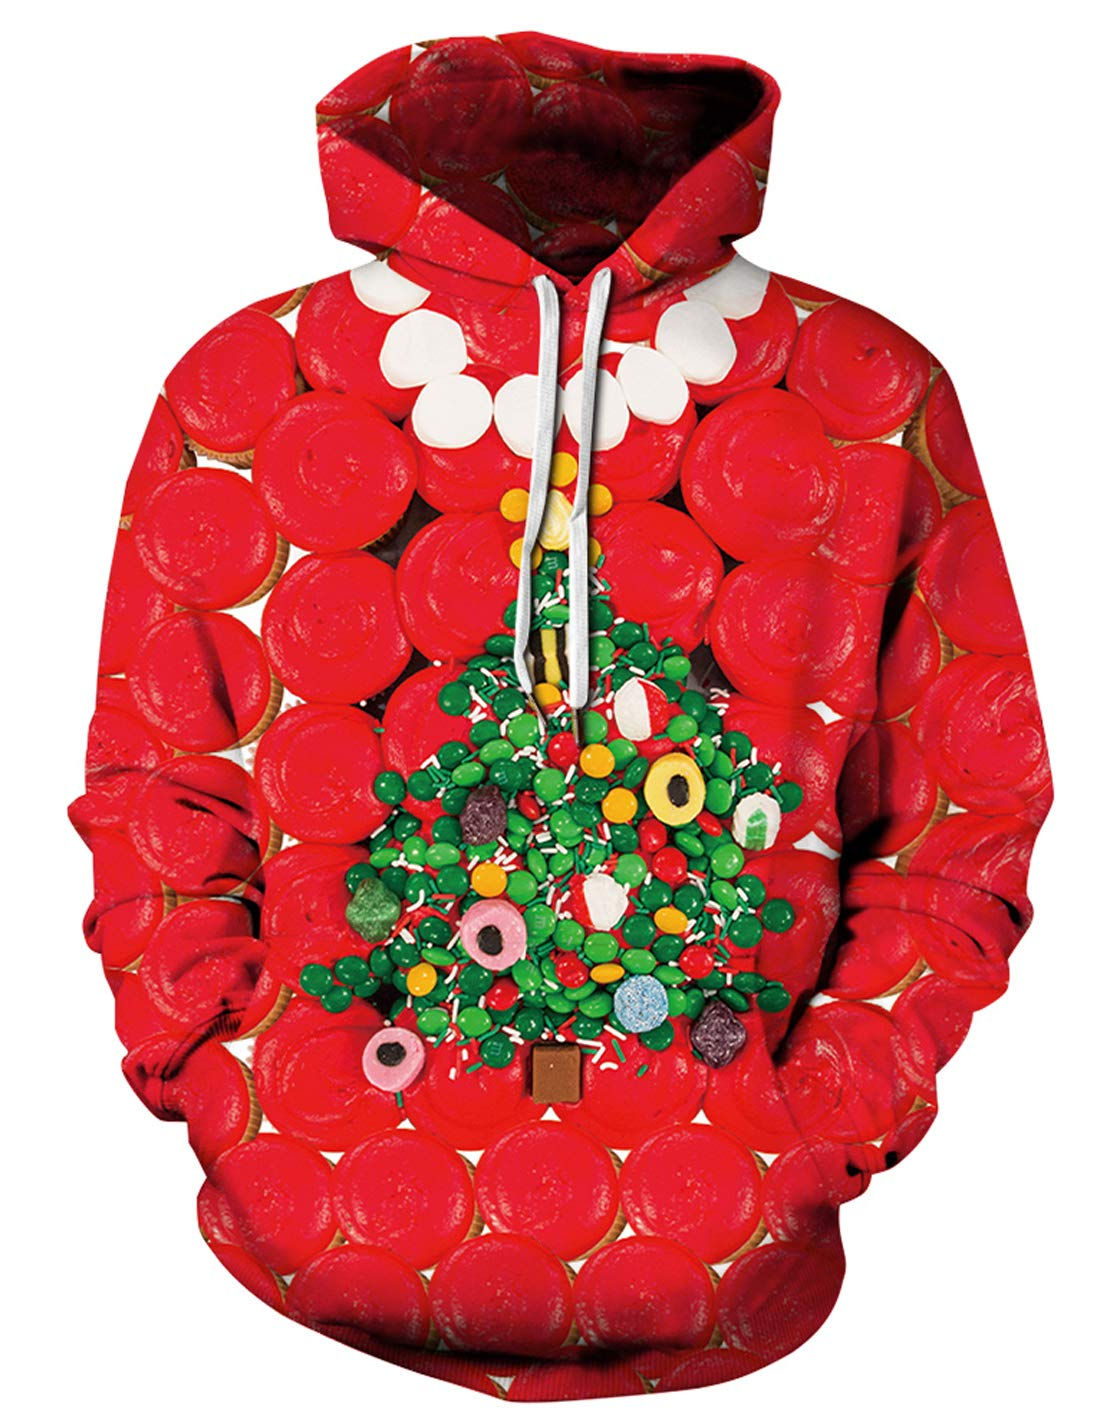 URVIP Unisex Realistic 3D Print Pullover Sweatshirt Hoodies with Big Pockets QYDM-461 XXL/XXXL by URVIP